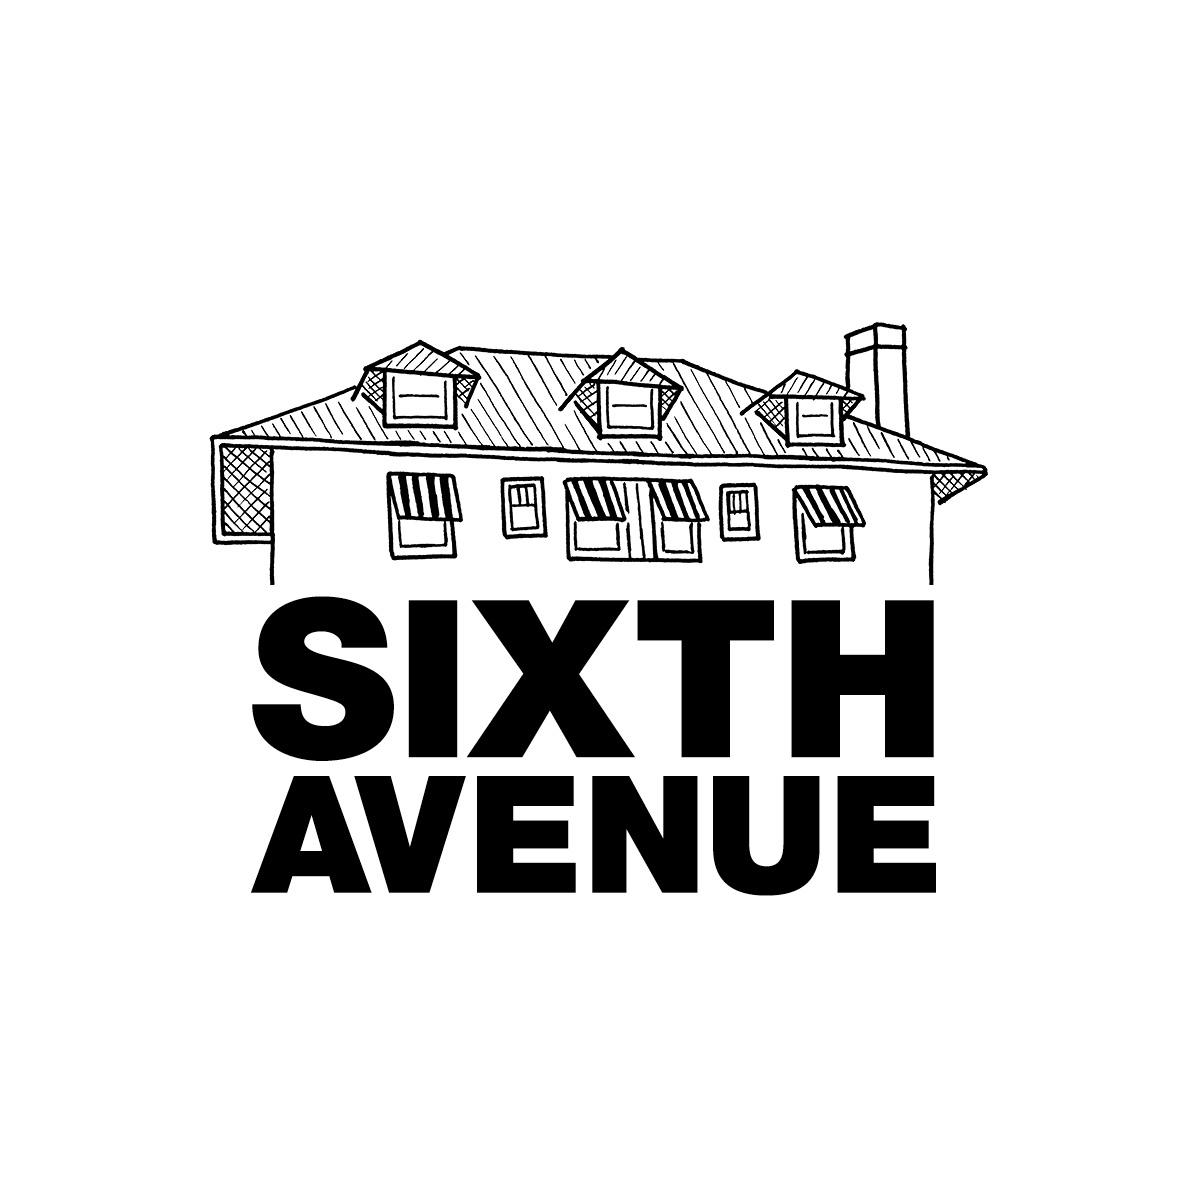 Sixth_Ave_logo.jpg